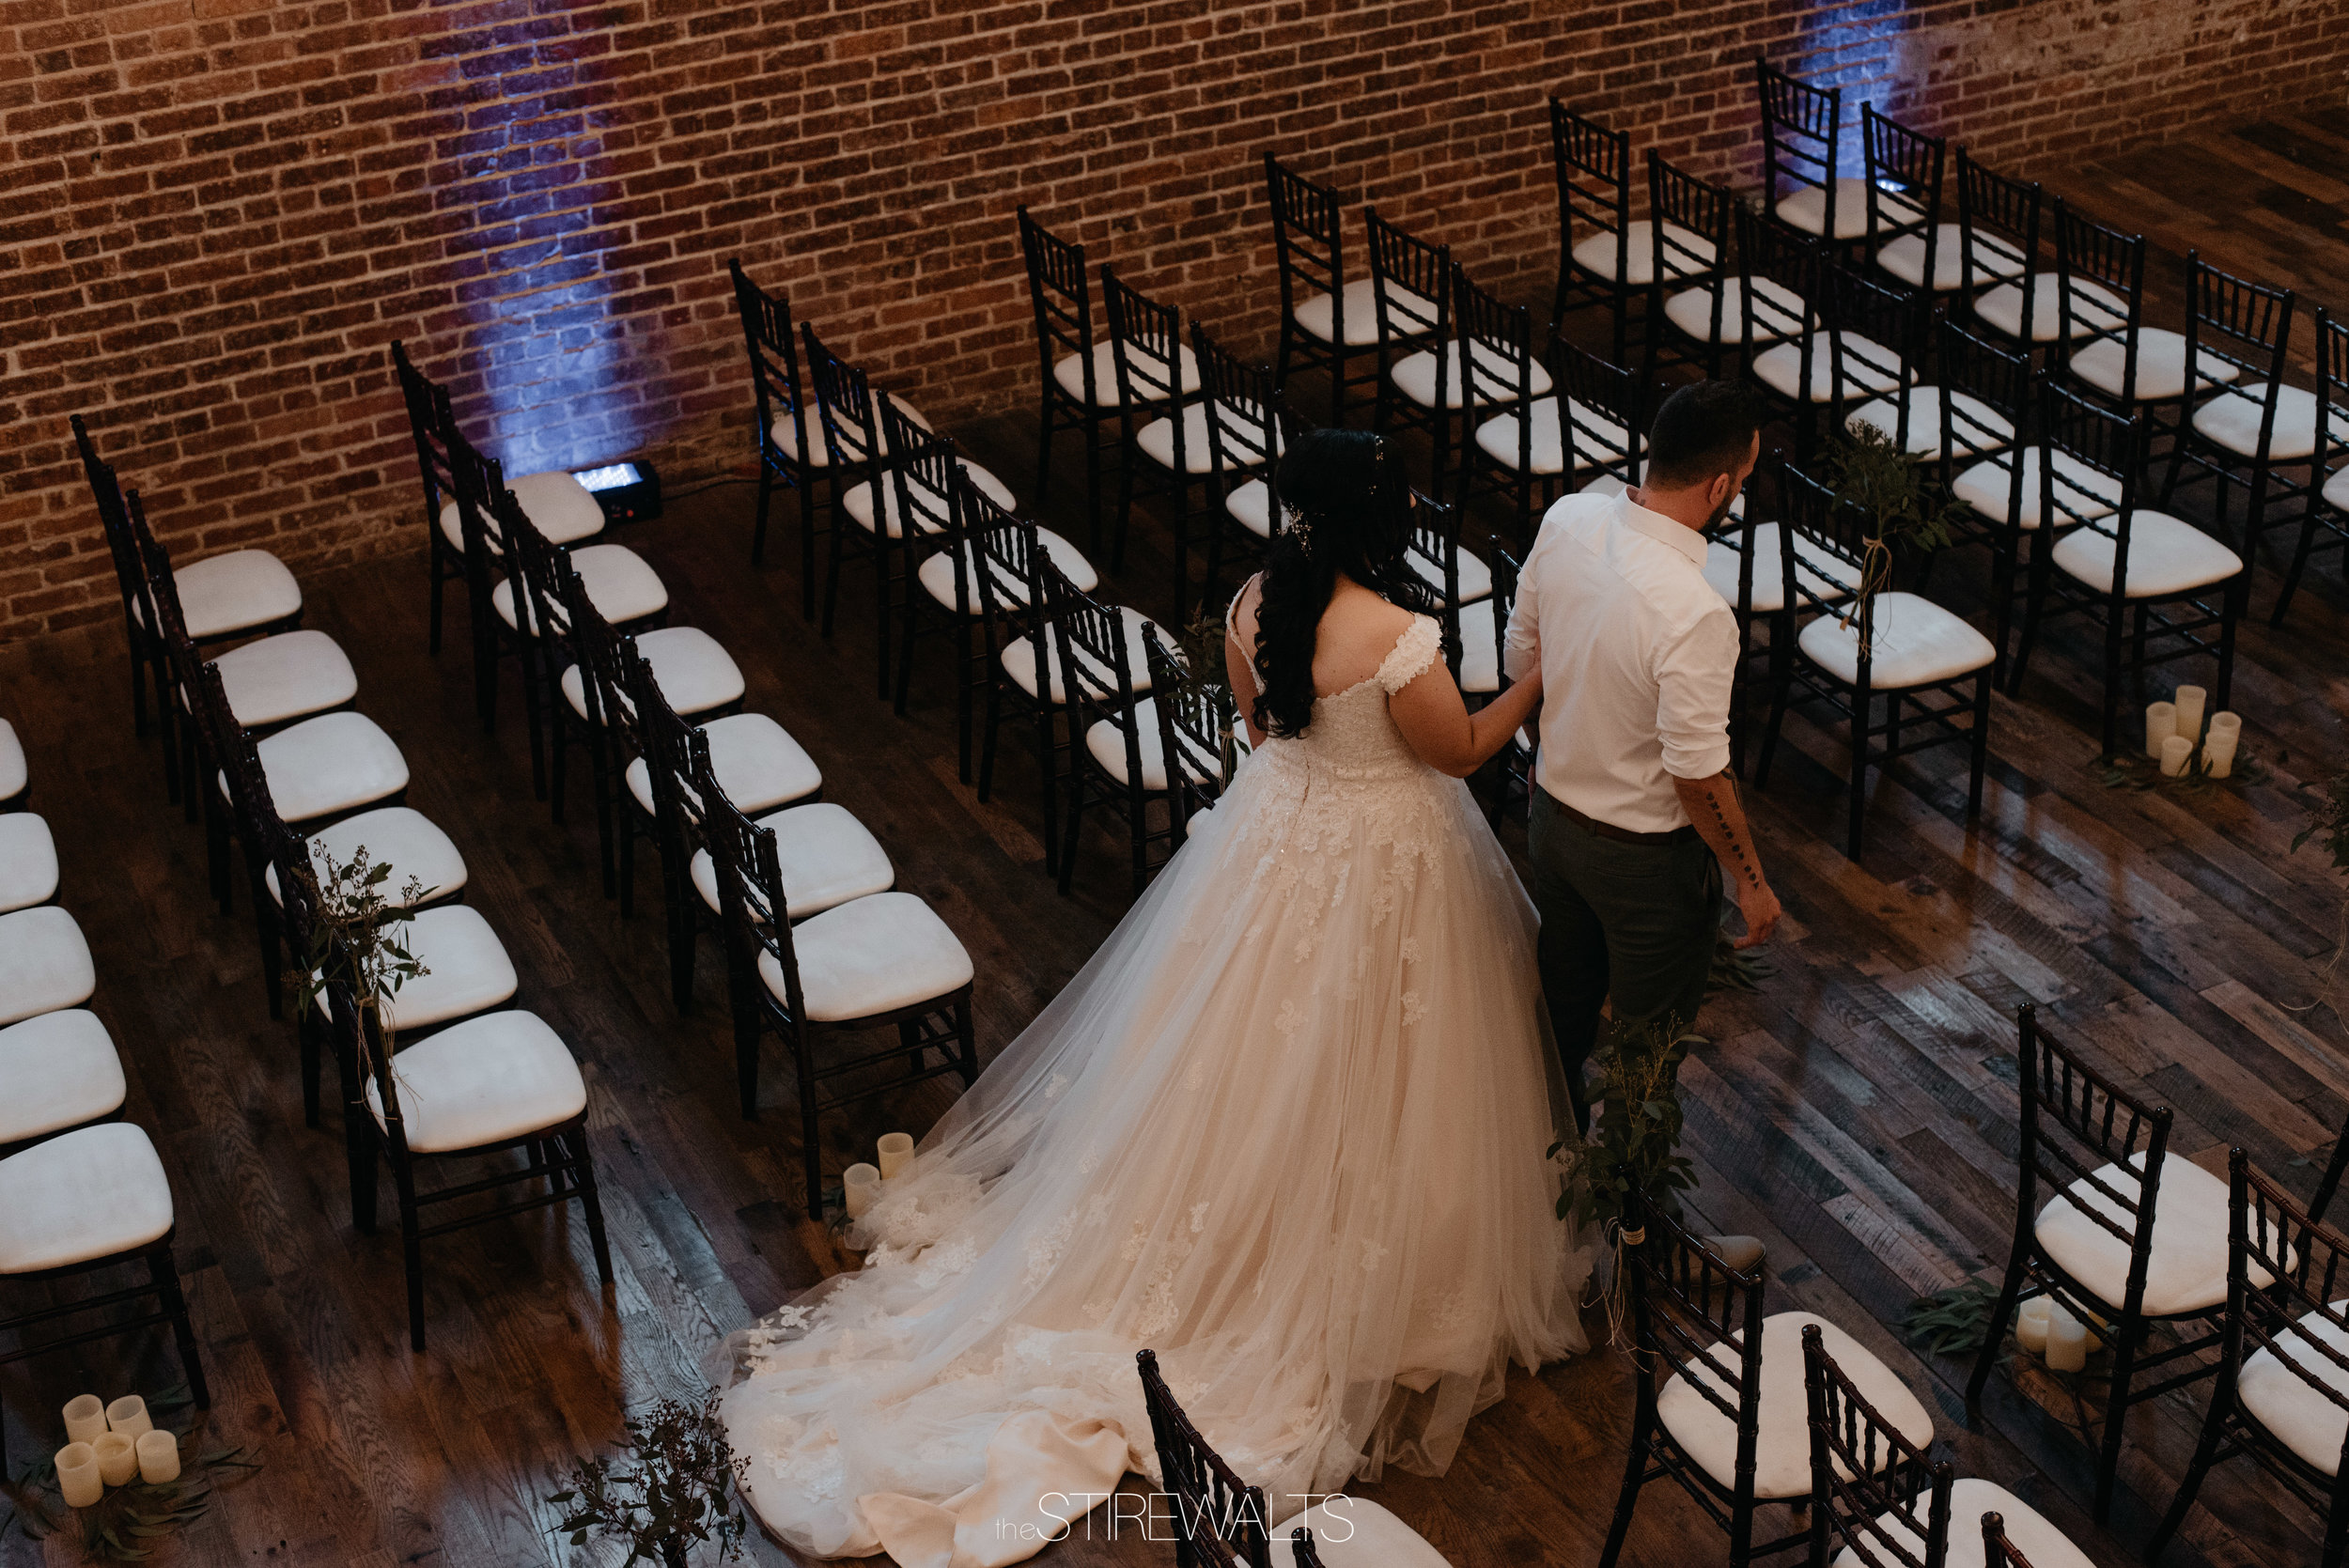 Sara.Jon.Wedding.Blog.2018.©TheStirewalts-28.jpg